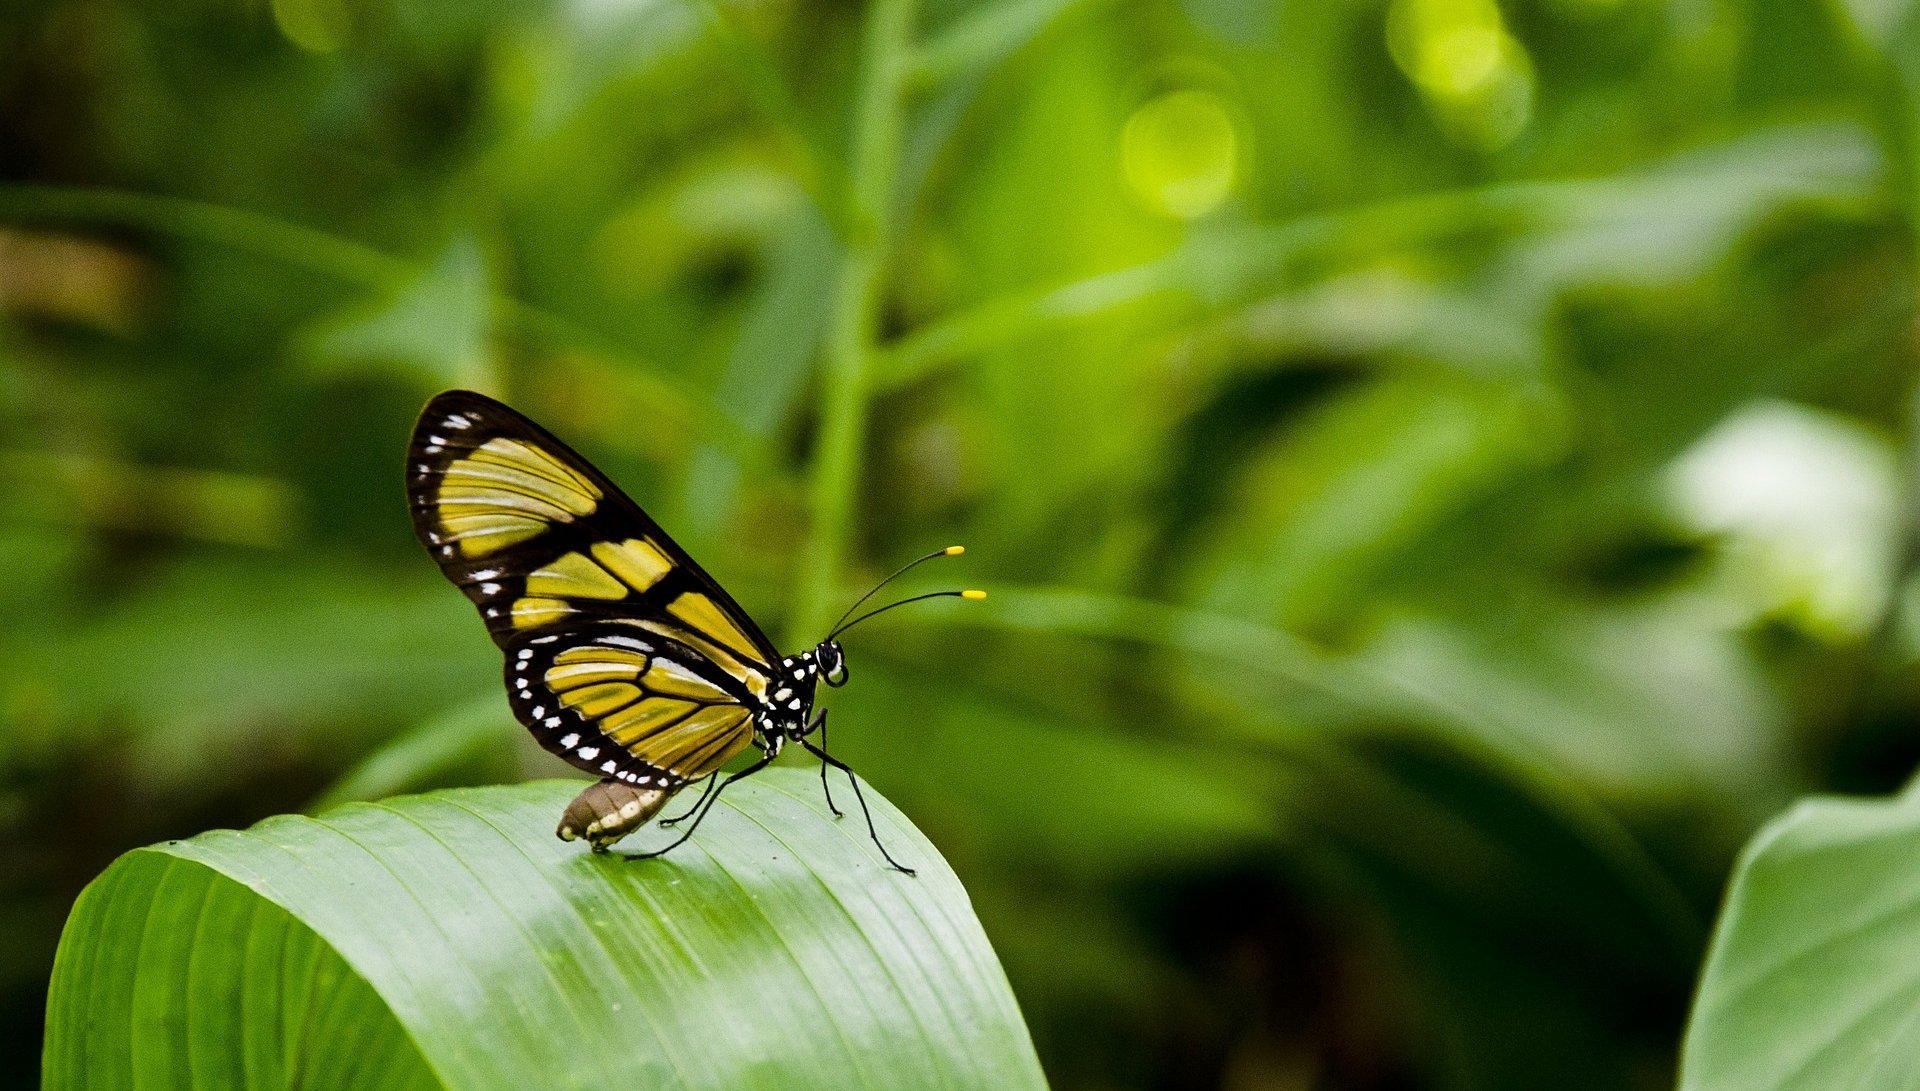 butterfly-404731_1920-aspect-ratio-95x54